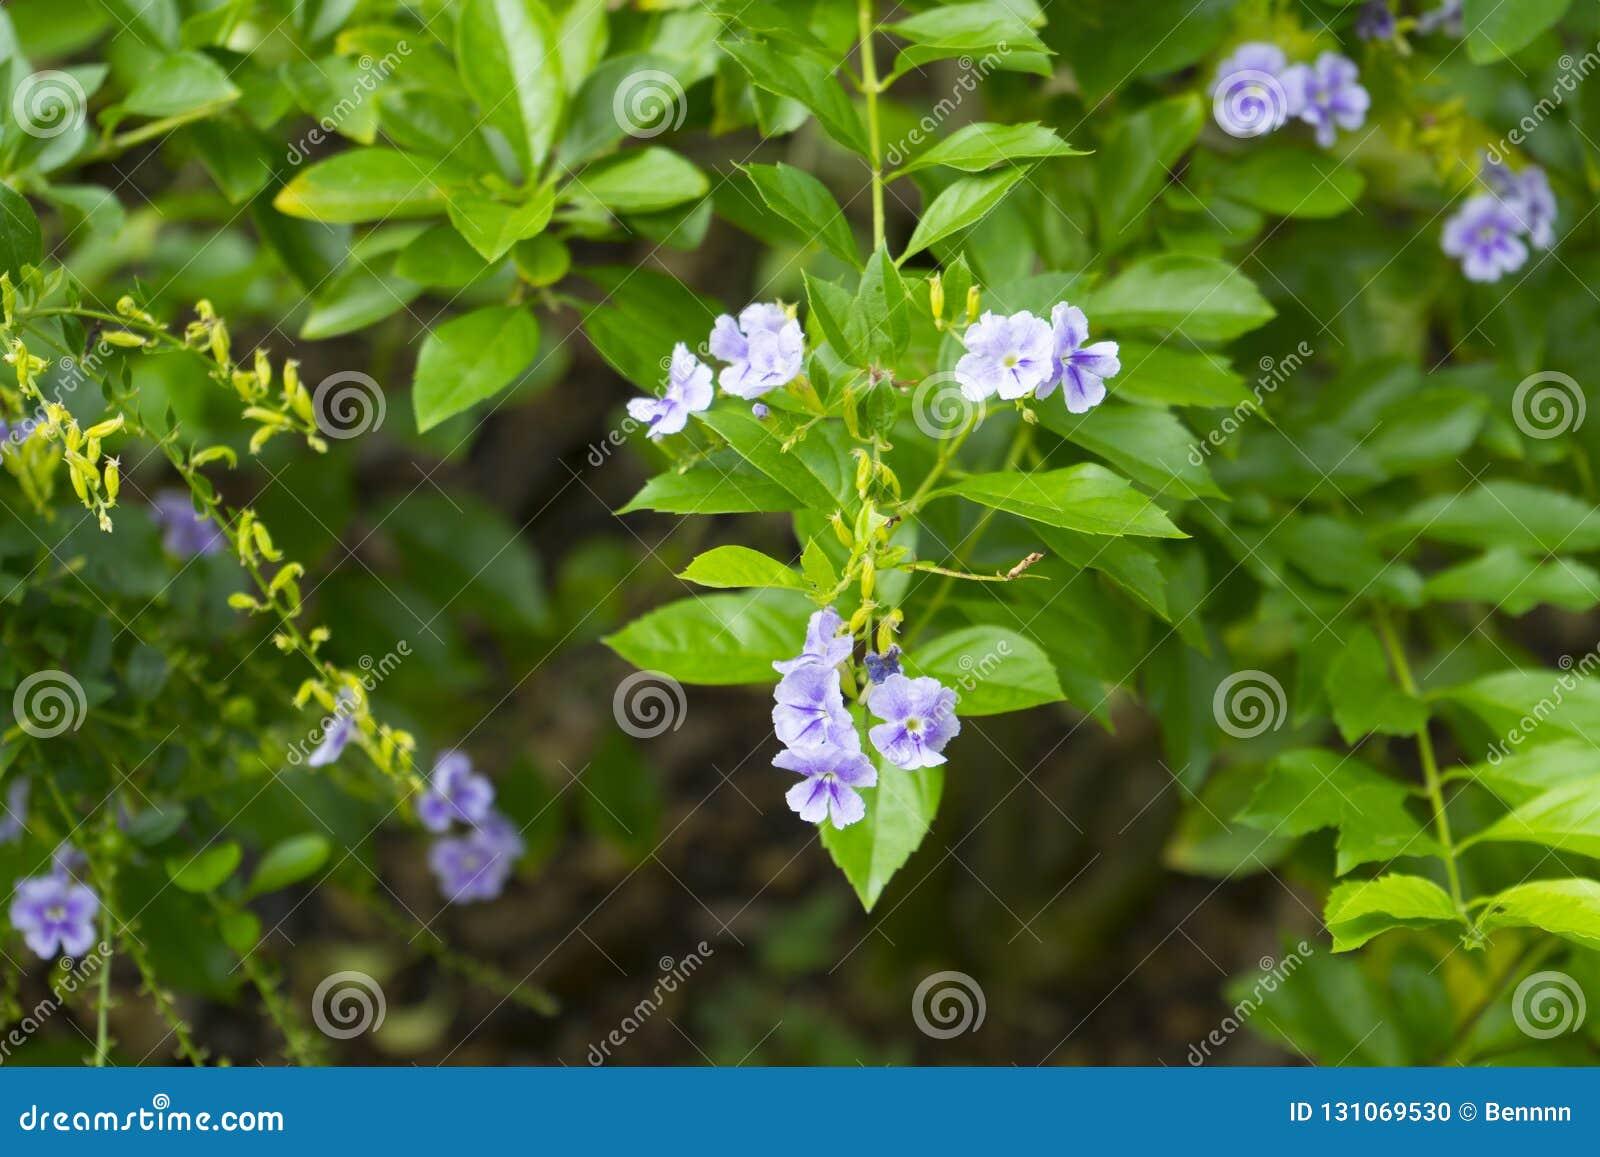 Golden Dew Drop, The flowers are light-blue or lavender color.